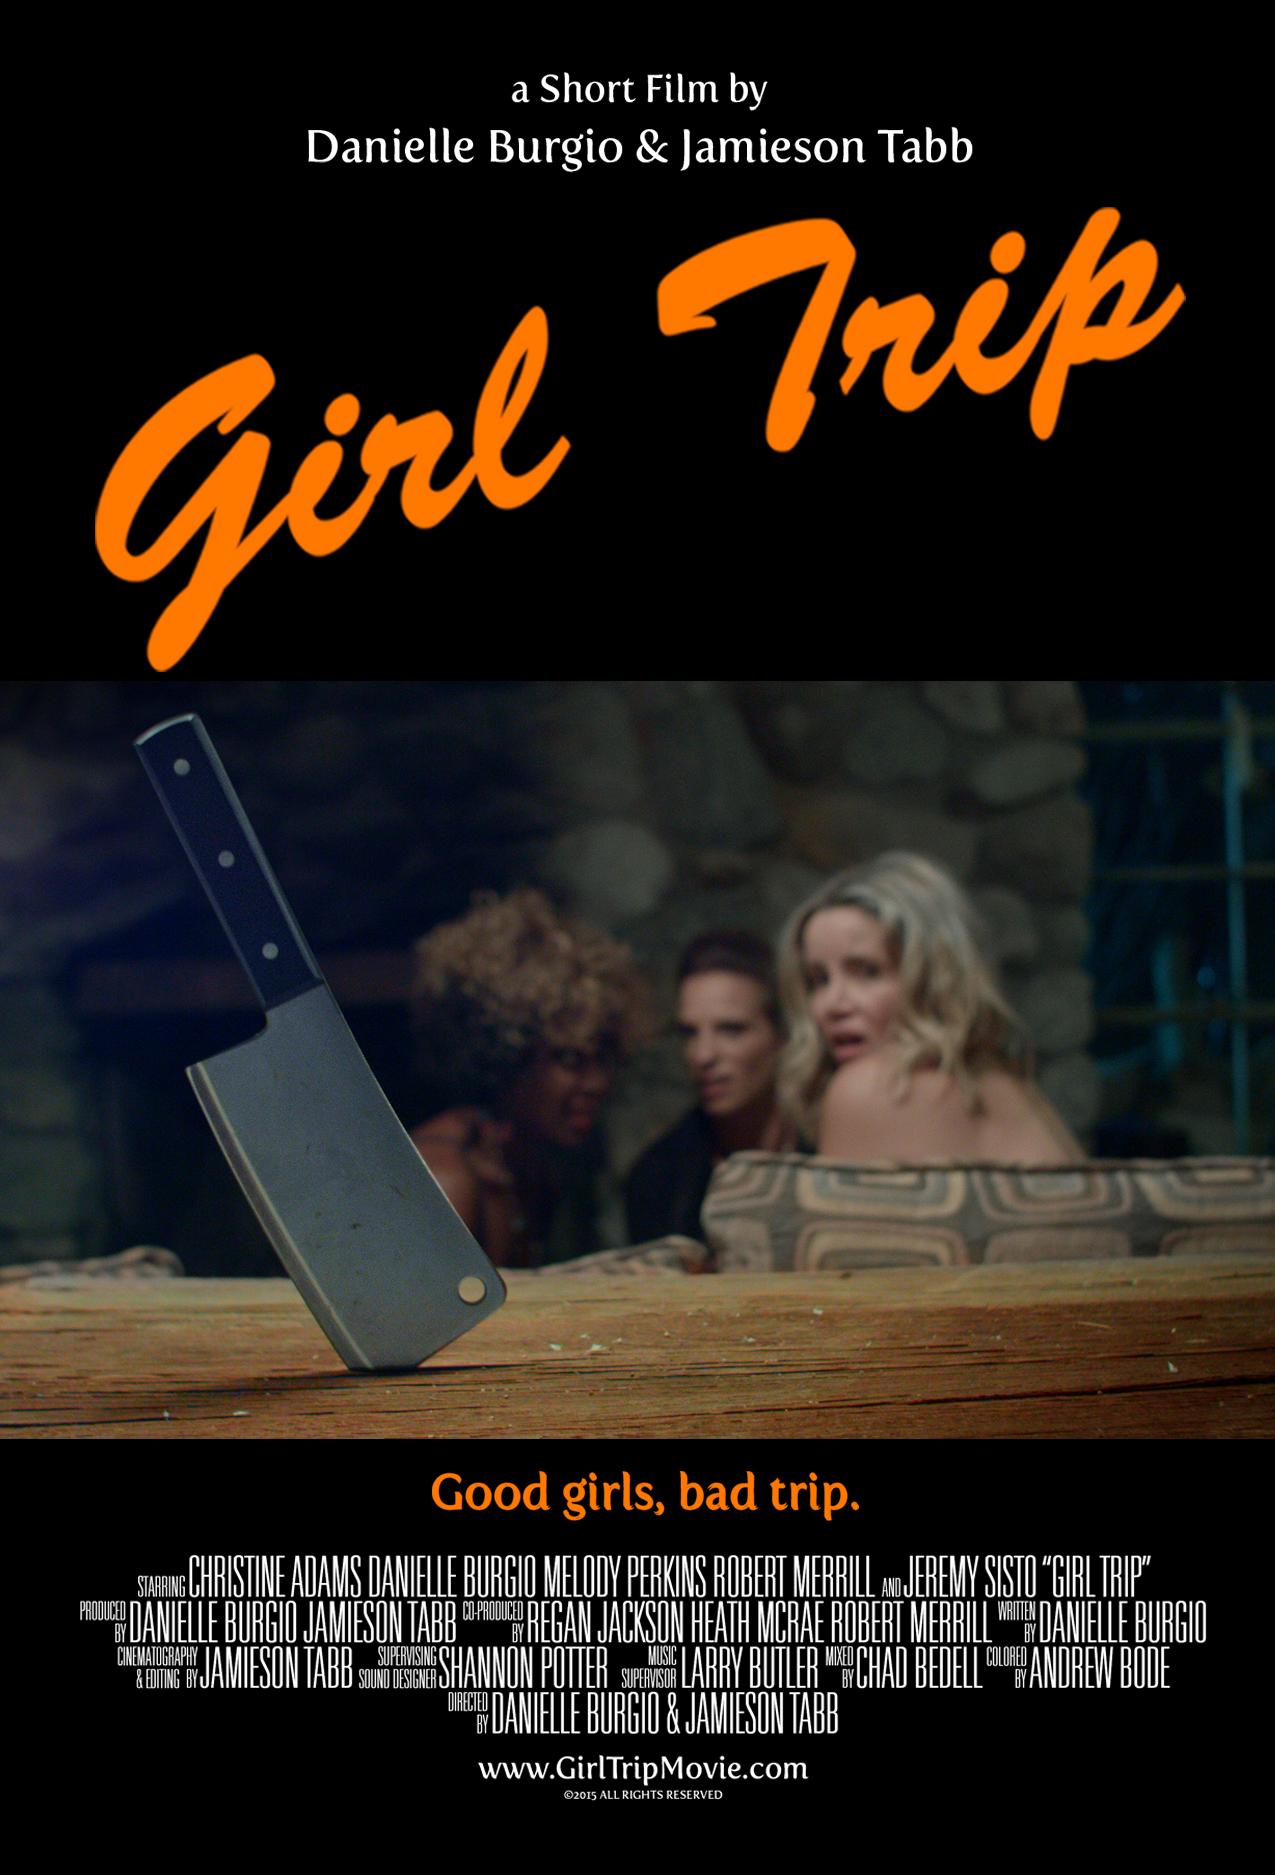 GirlTripPostcard.jpg